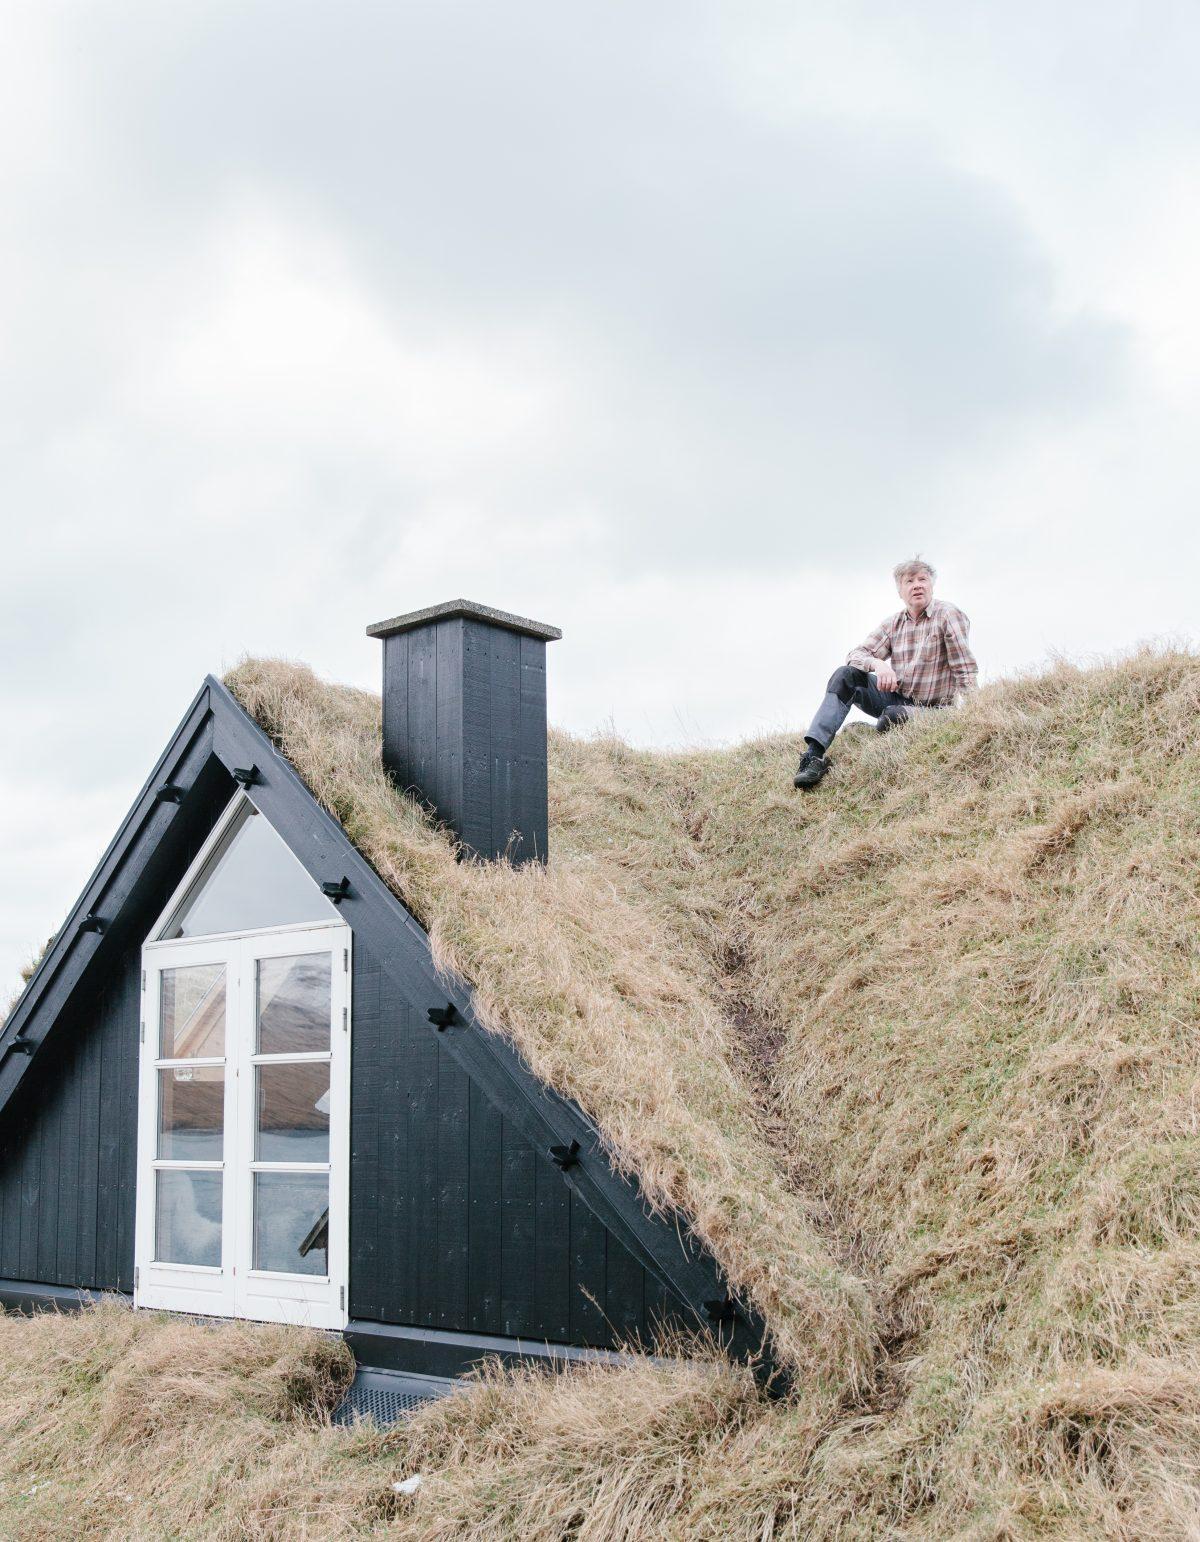 Sigurd Nordendal, Faroe Islands, 2016